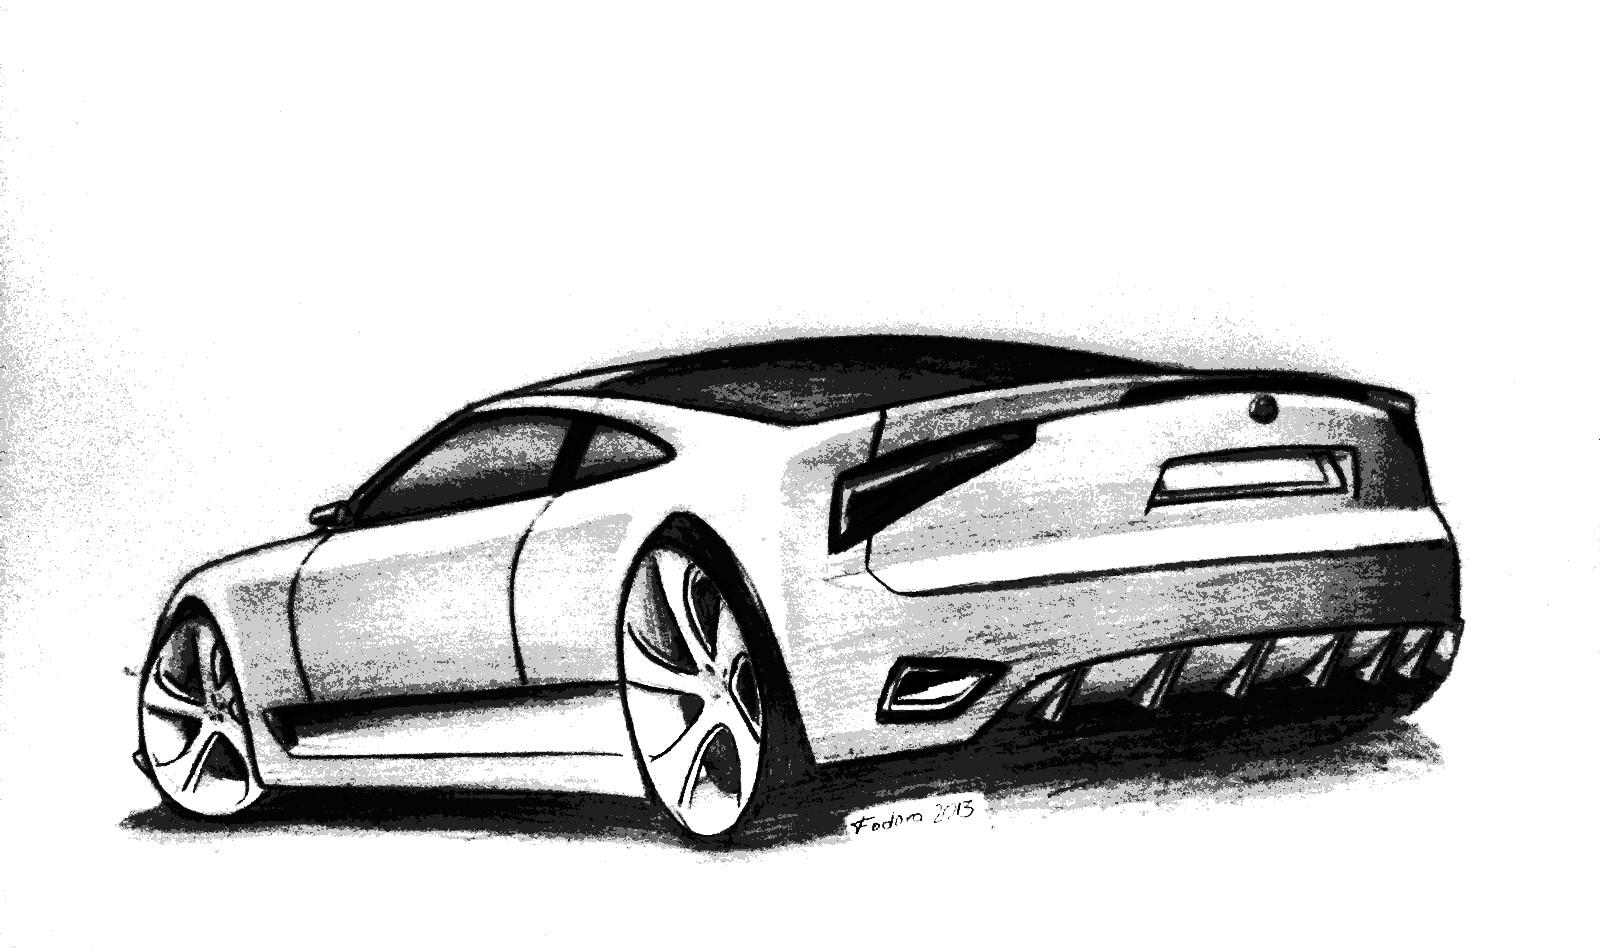 car sketch by robert187 on DeviantArt